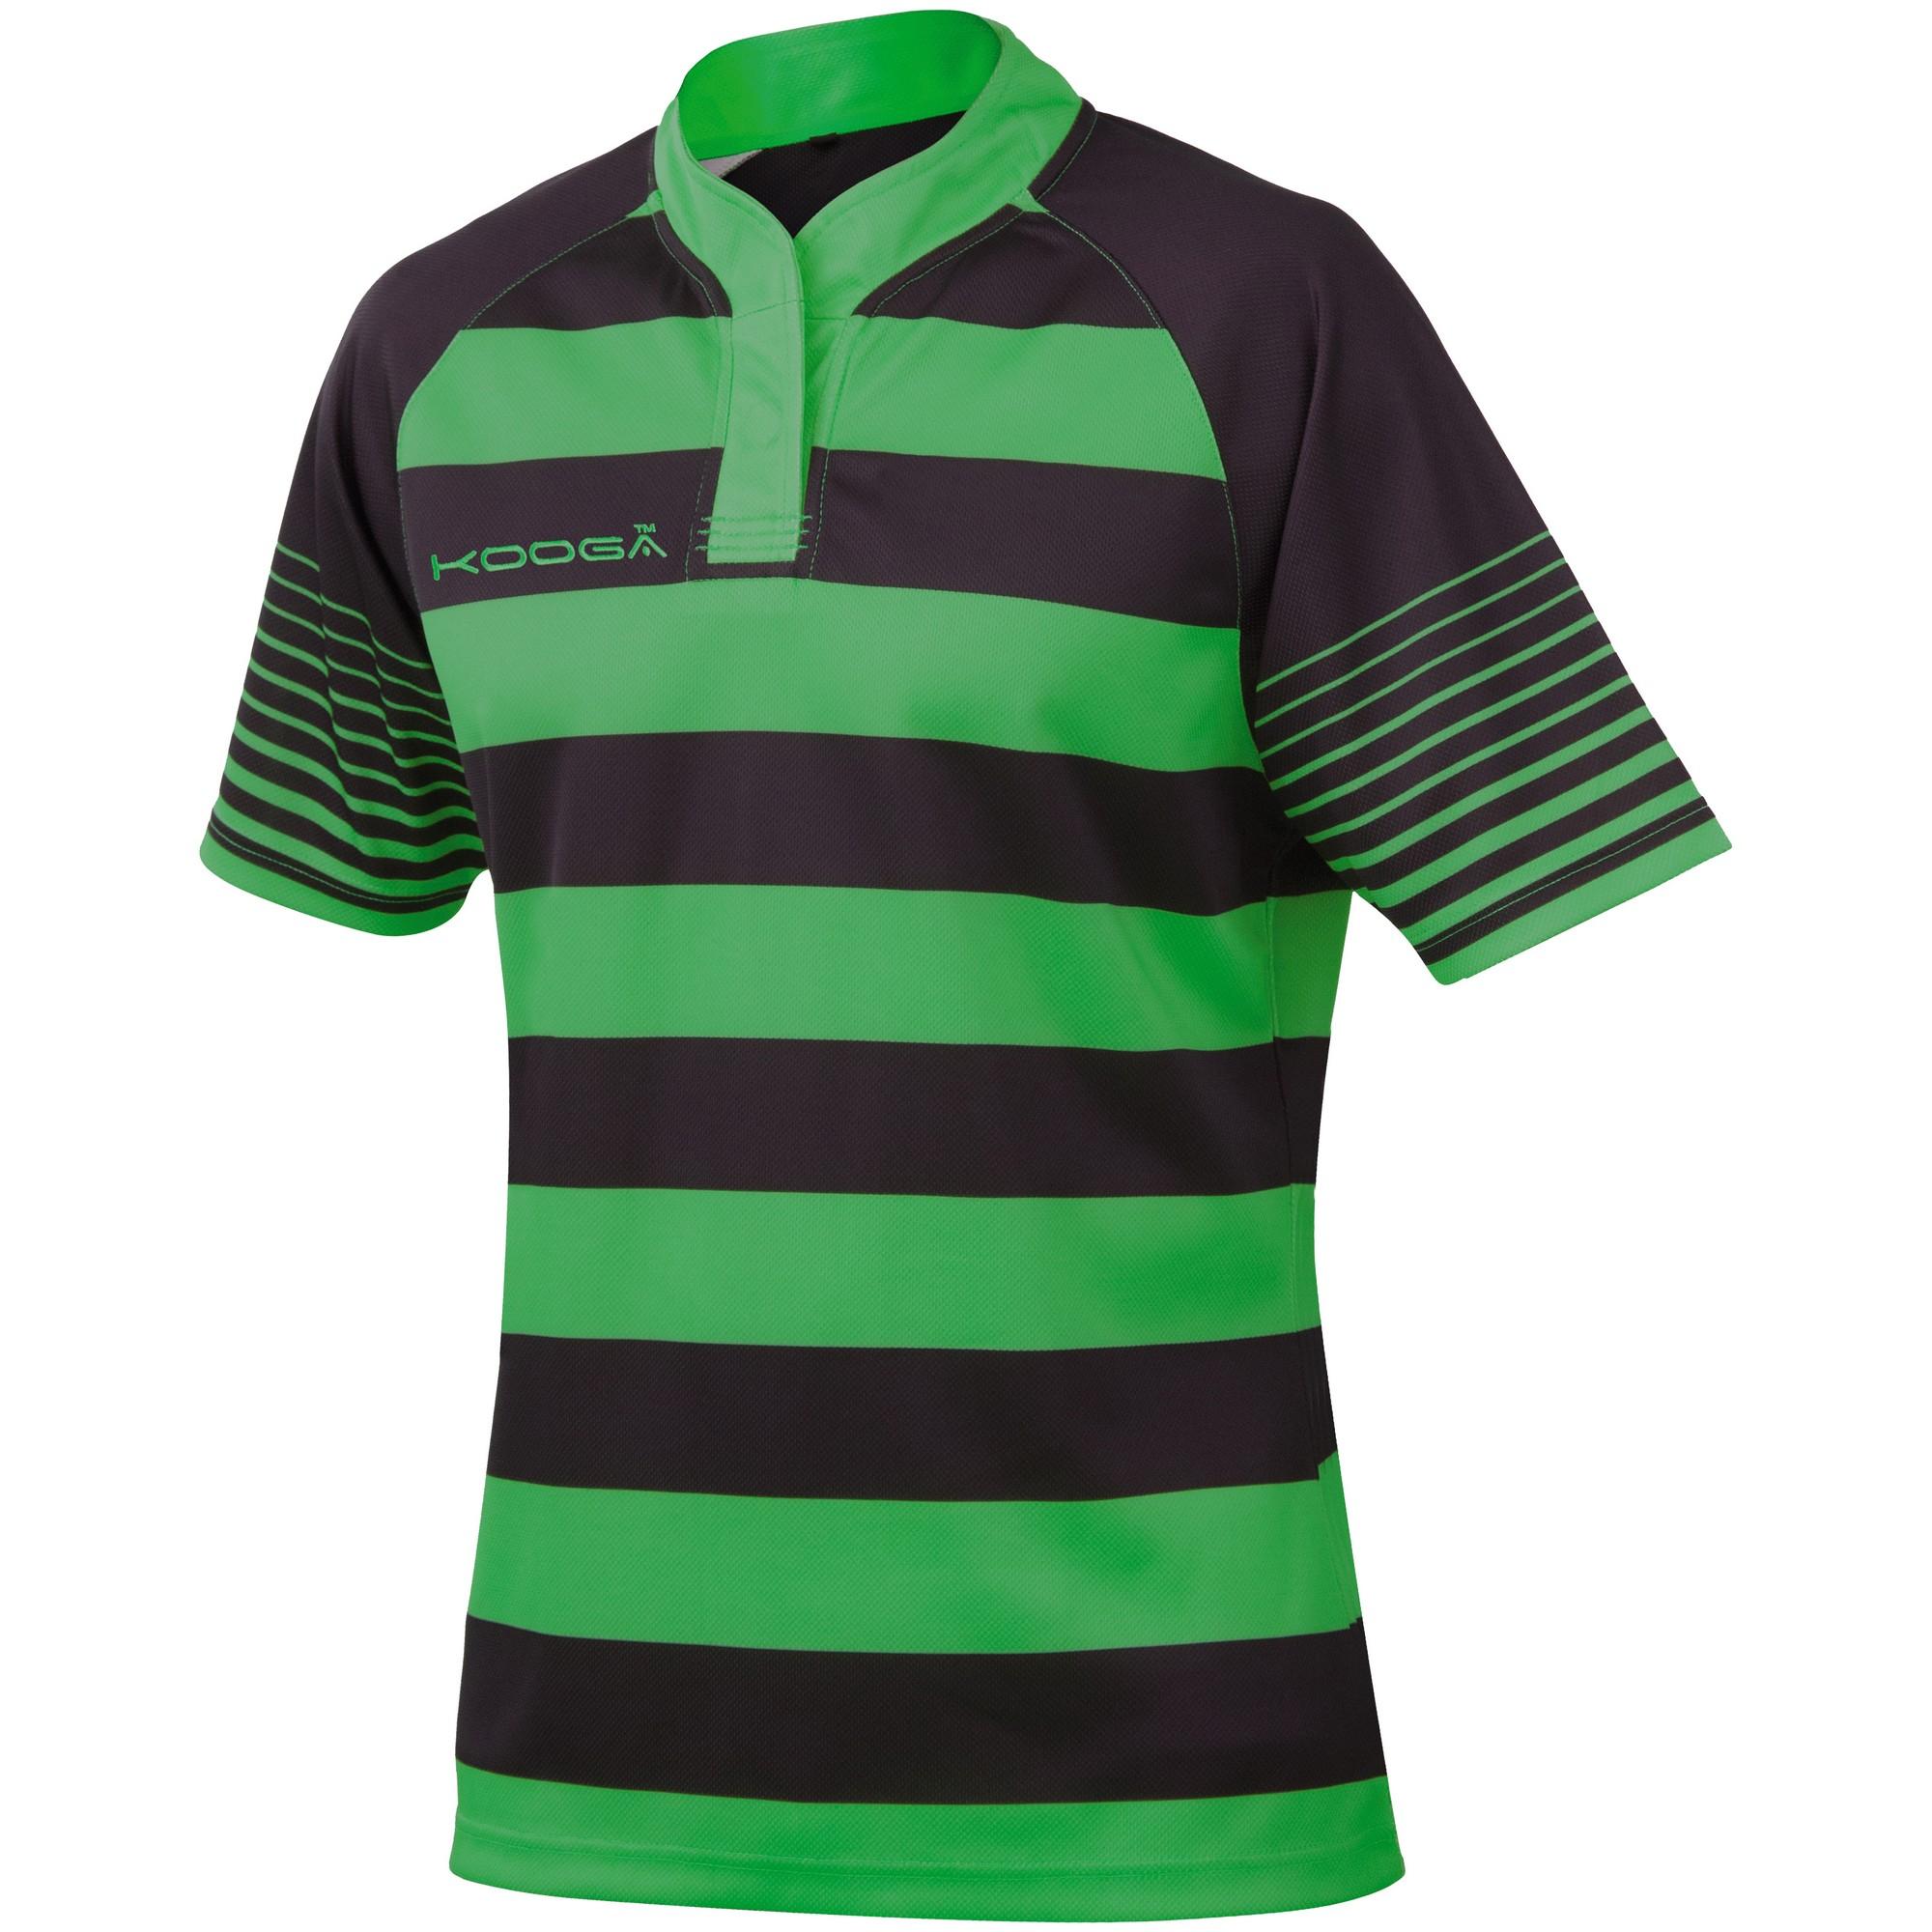 KooGa Boys Junior Touchline Hooped Match Rugby Shirt (S) (Black / Emerald Green)